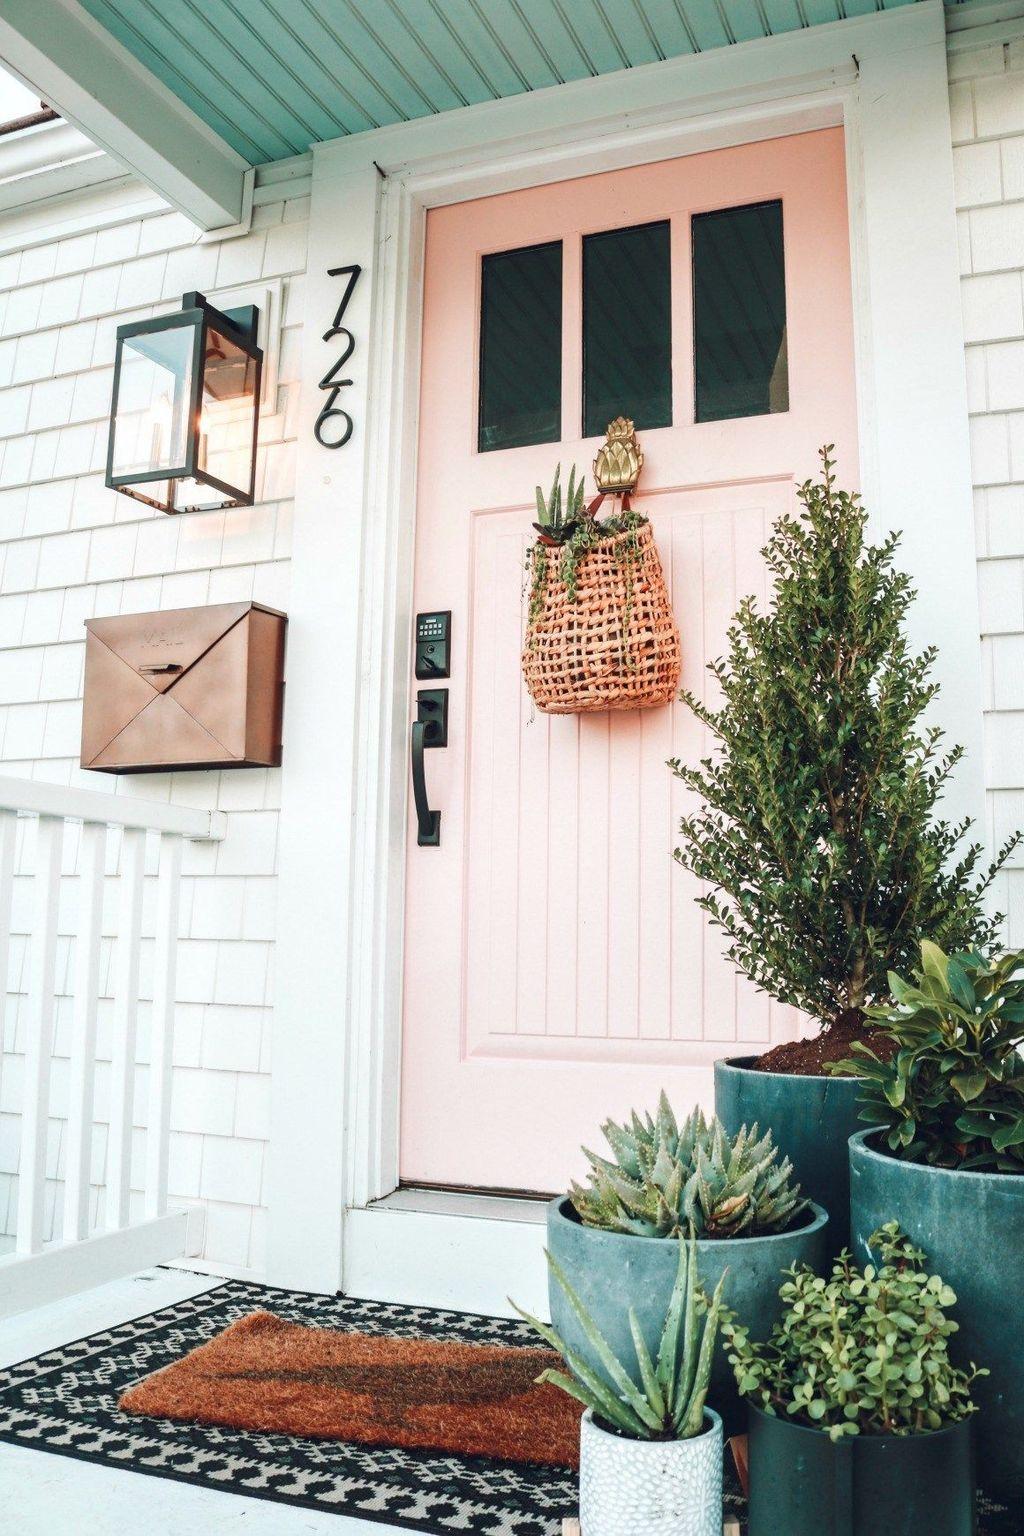 Inspiring Spring Planters Design Ideas For Front Door 29